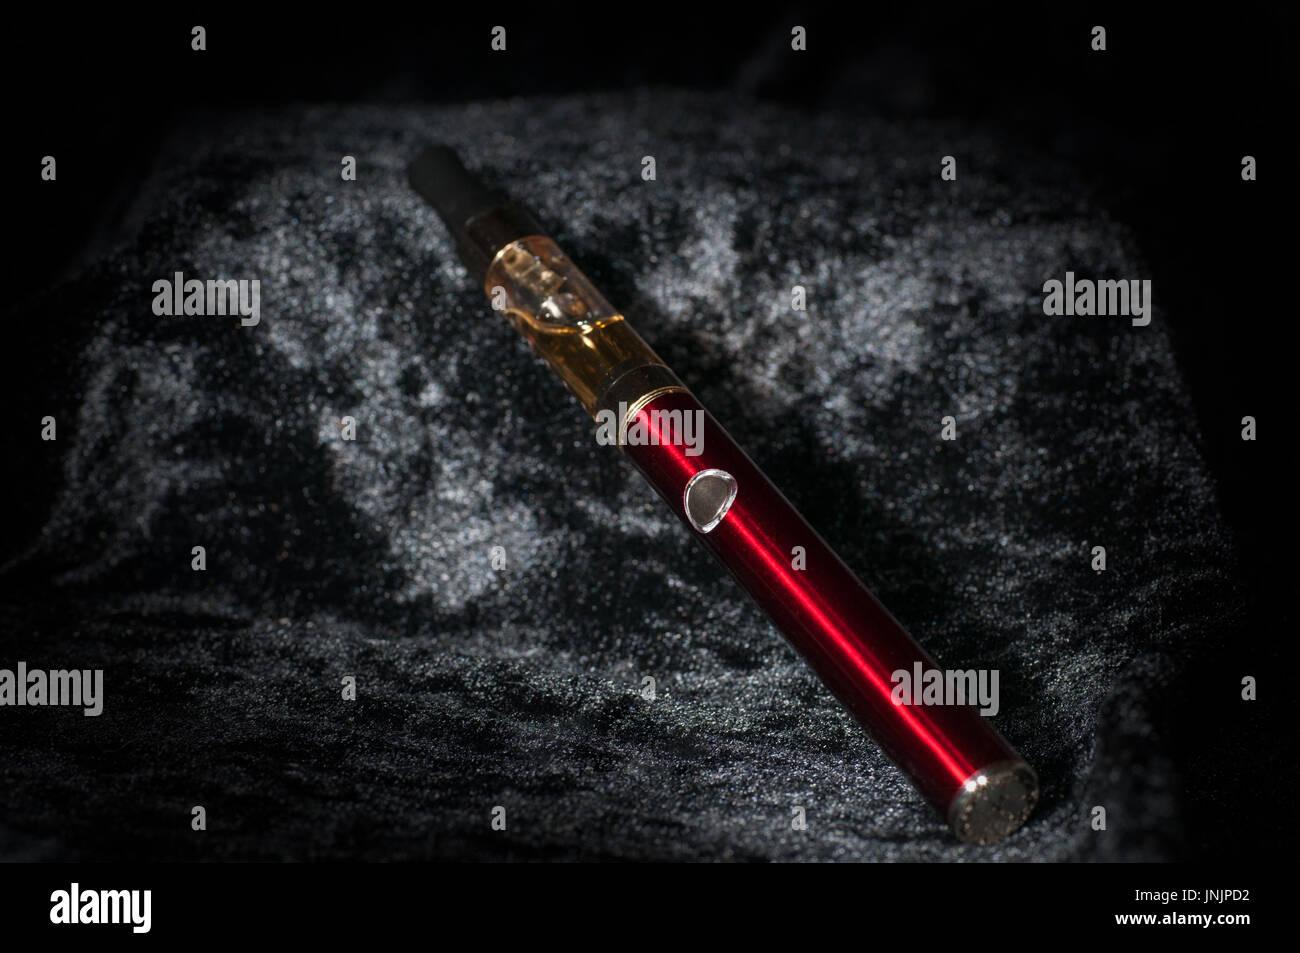 electronic cigarette with smoke - Stock Image